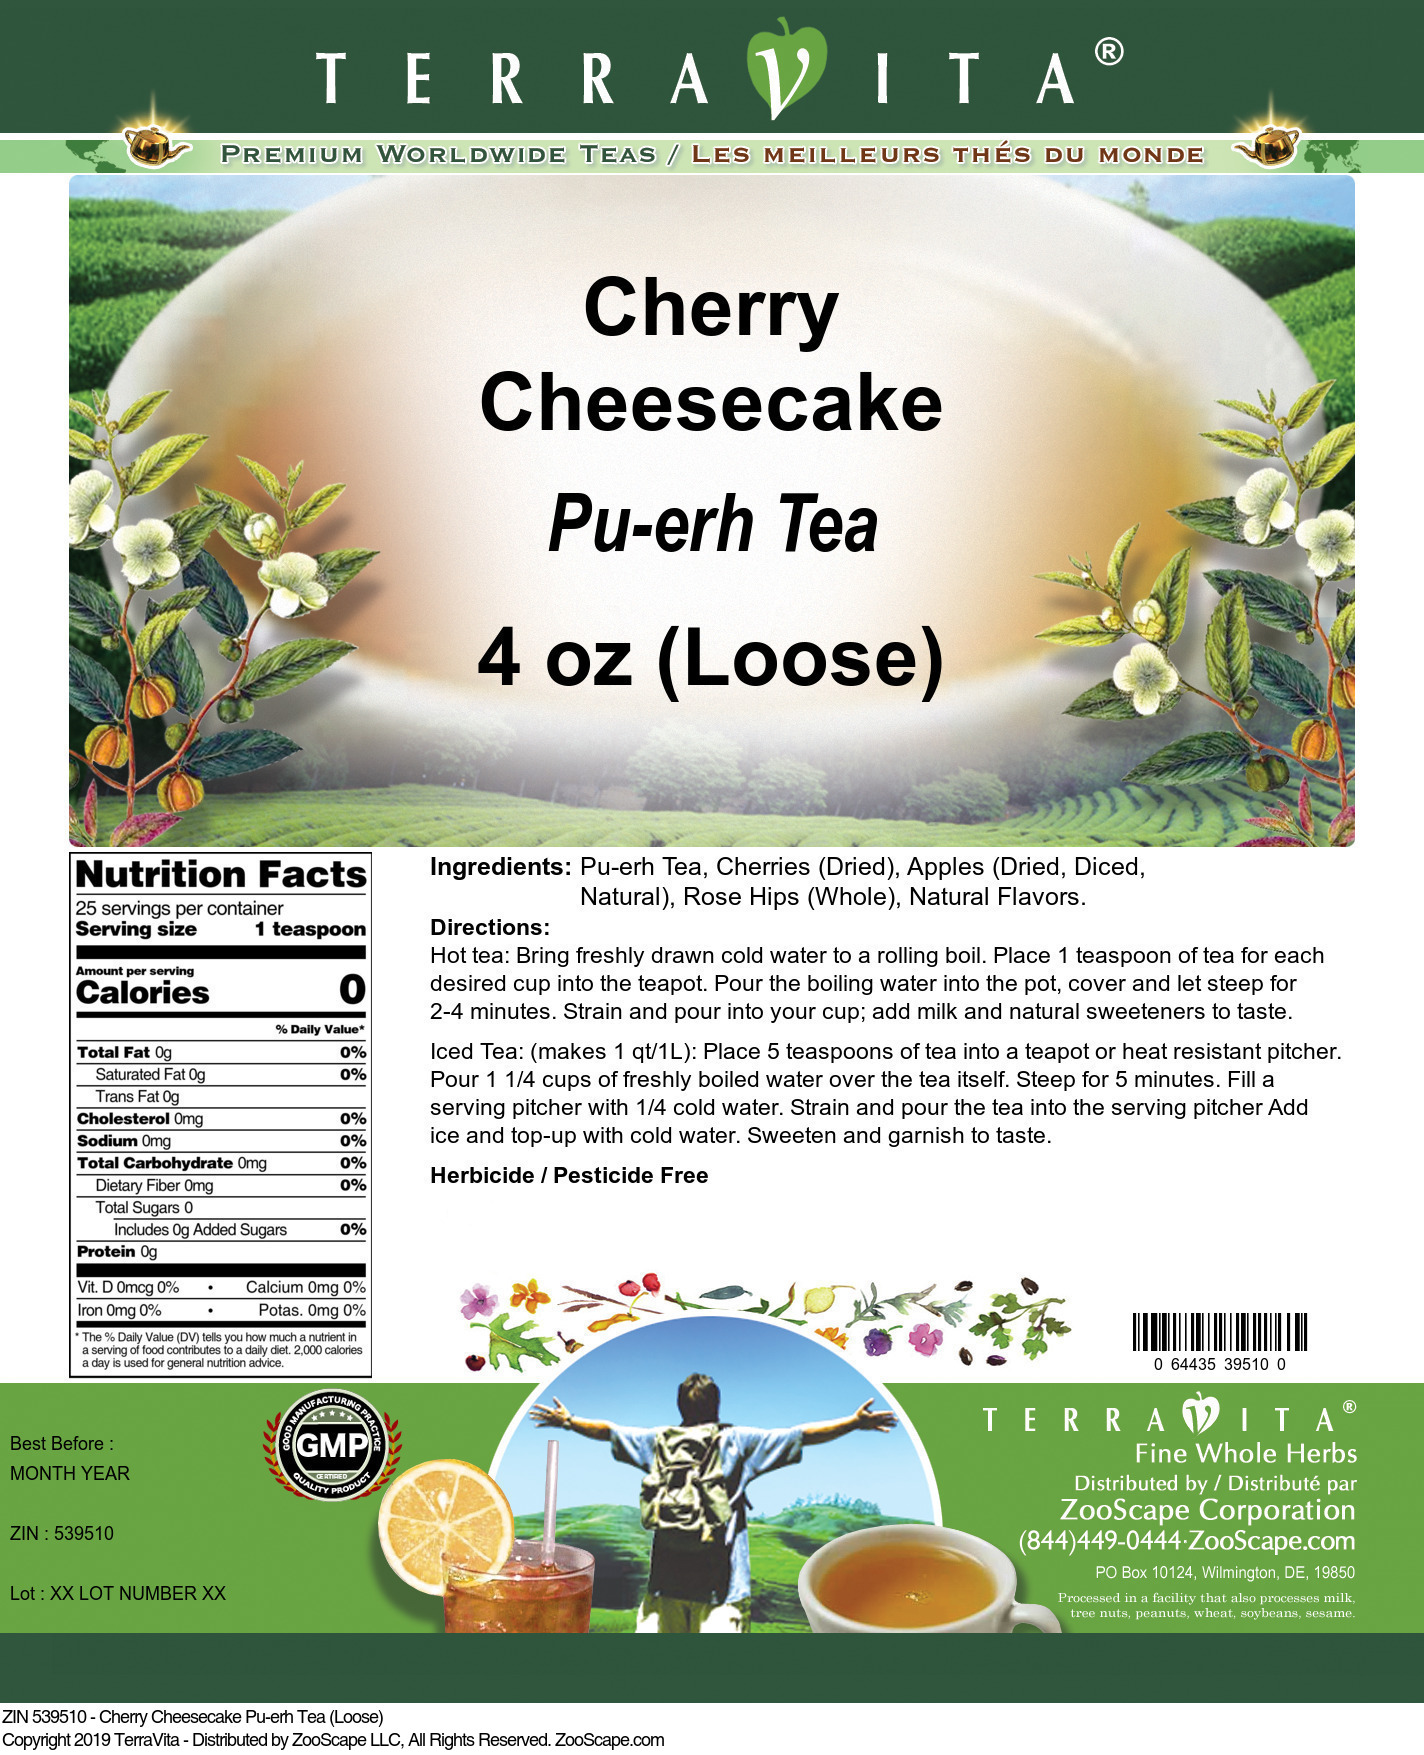 Cherry Cheesecake Pu-erh Tea (Loose)